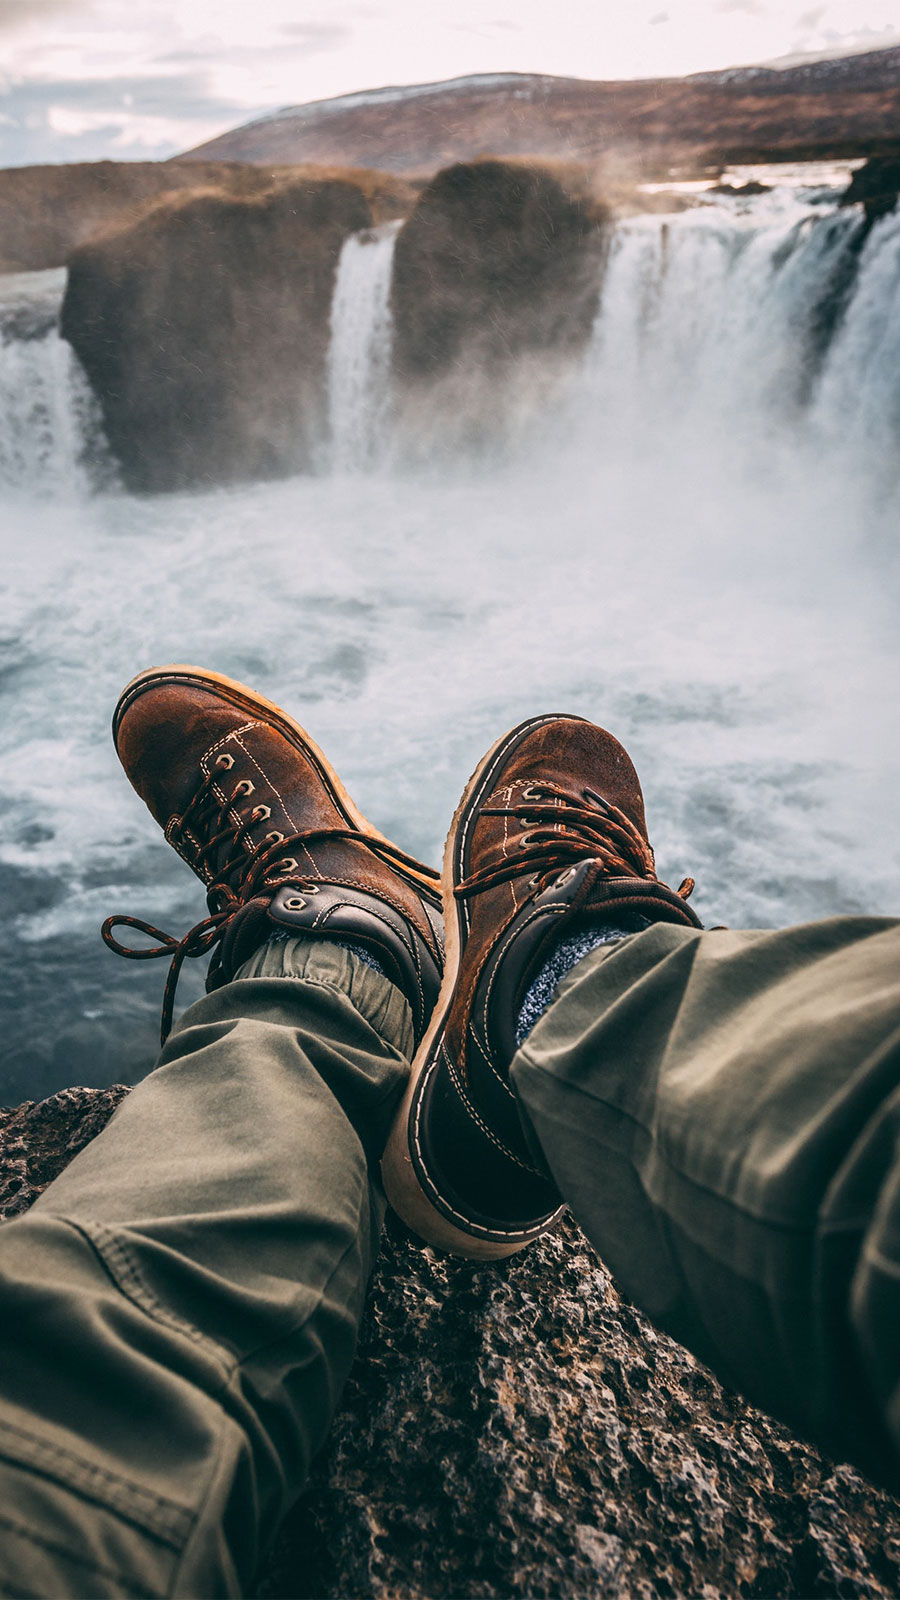 wallpaper adventure waterfall